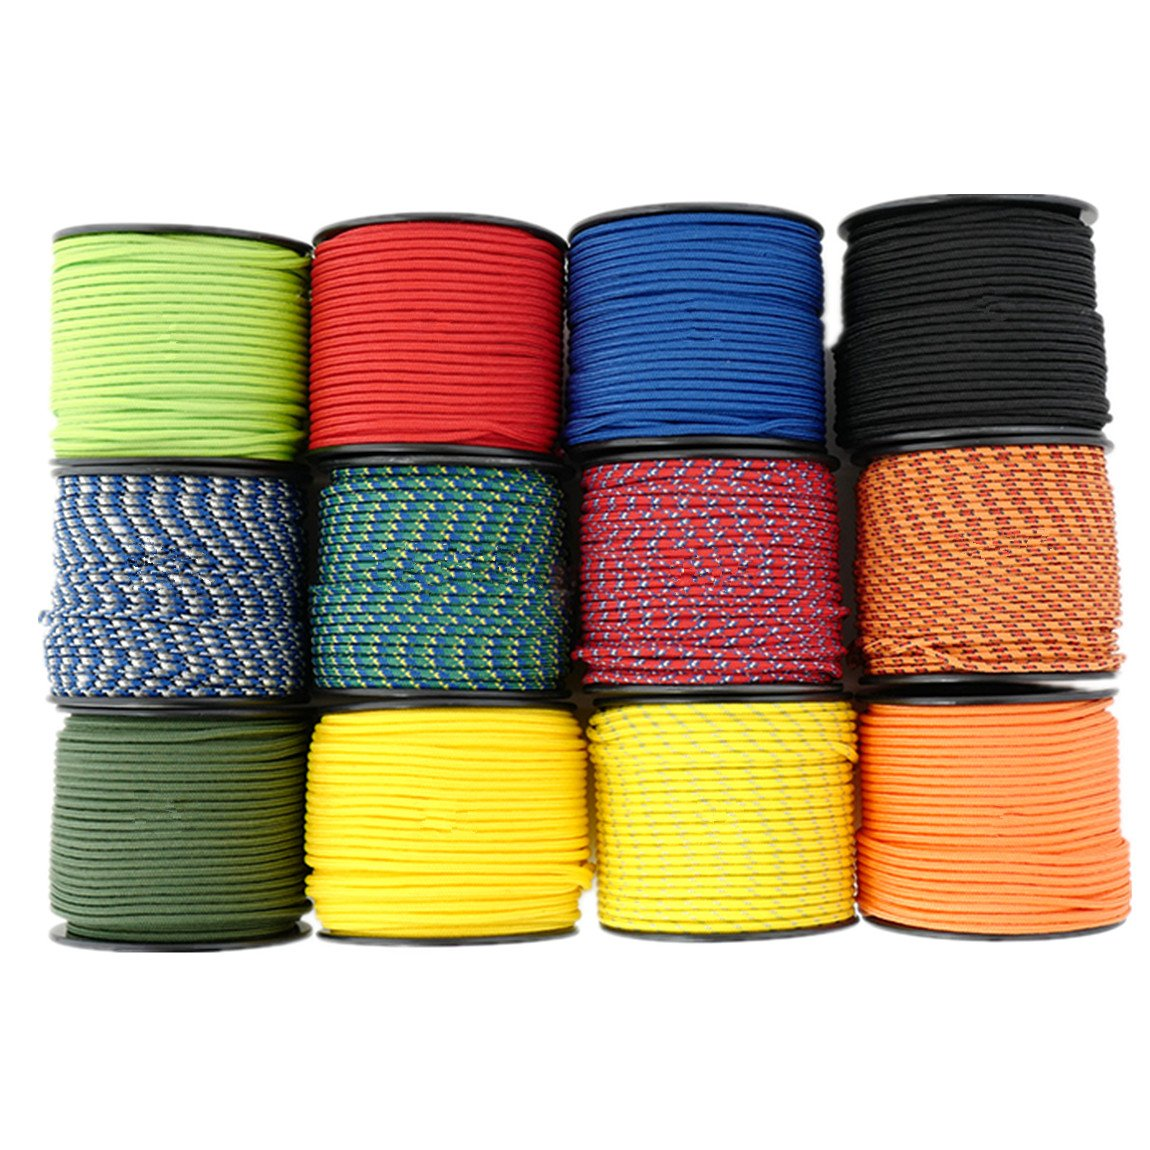 1//8 164ft Diamond Braid Nylon Rope,5 Strands Paracord Utility Rope,Multipurpose Nylon Twine 3mm